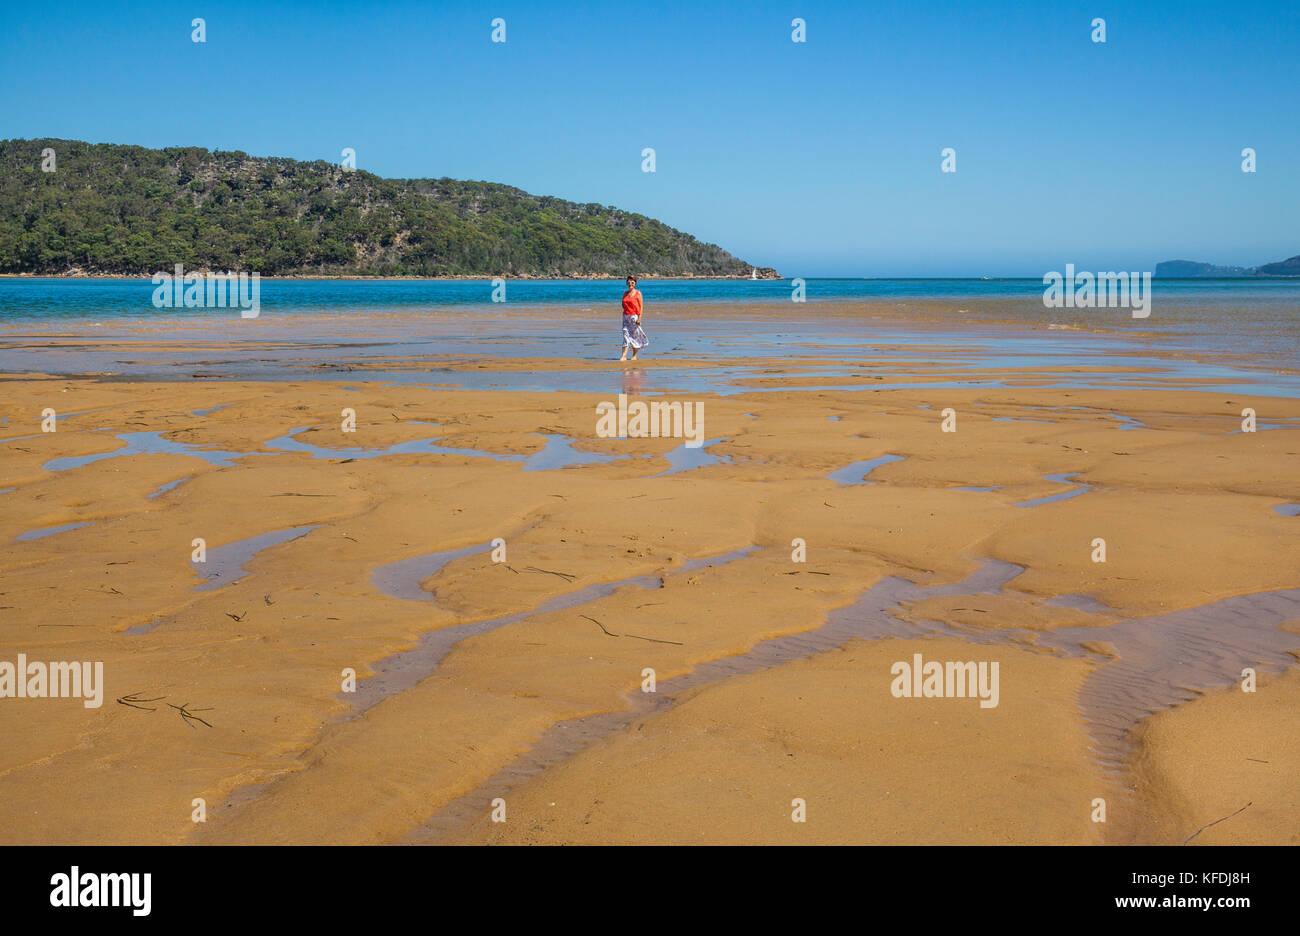 Australia, New South Wales, Central Coast, Broken Bay, sandbar at Umina Beach at low tide against the backdrop of - Stock Image